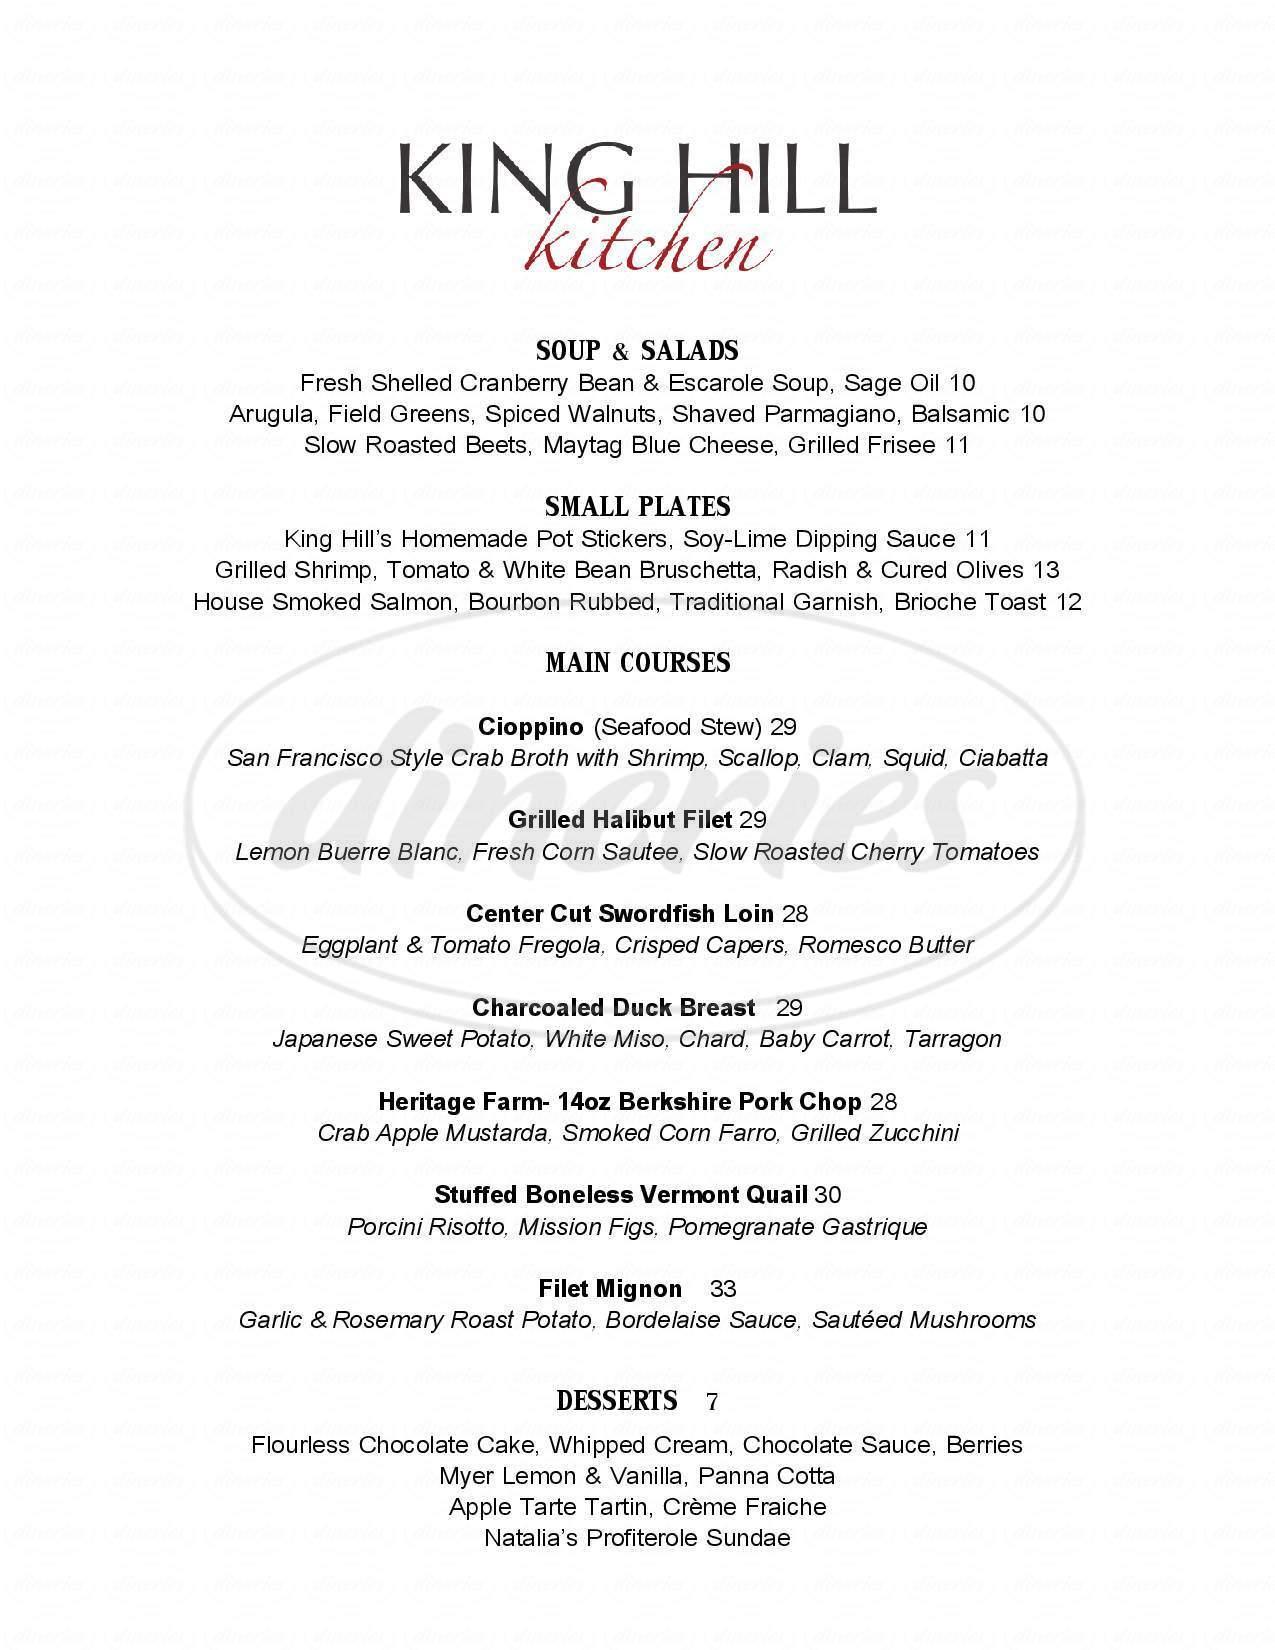 menu for King Hill Kitchen